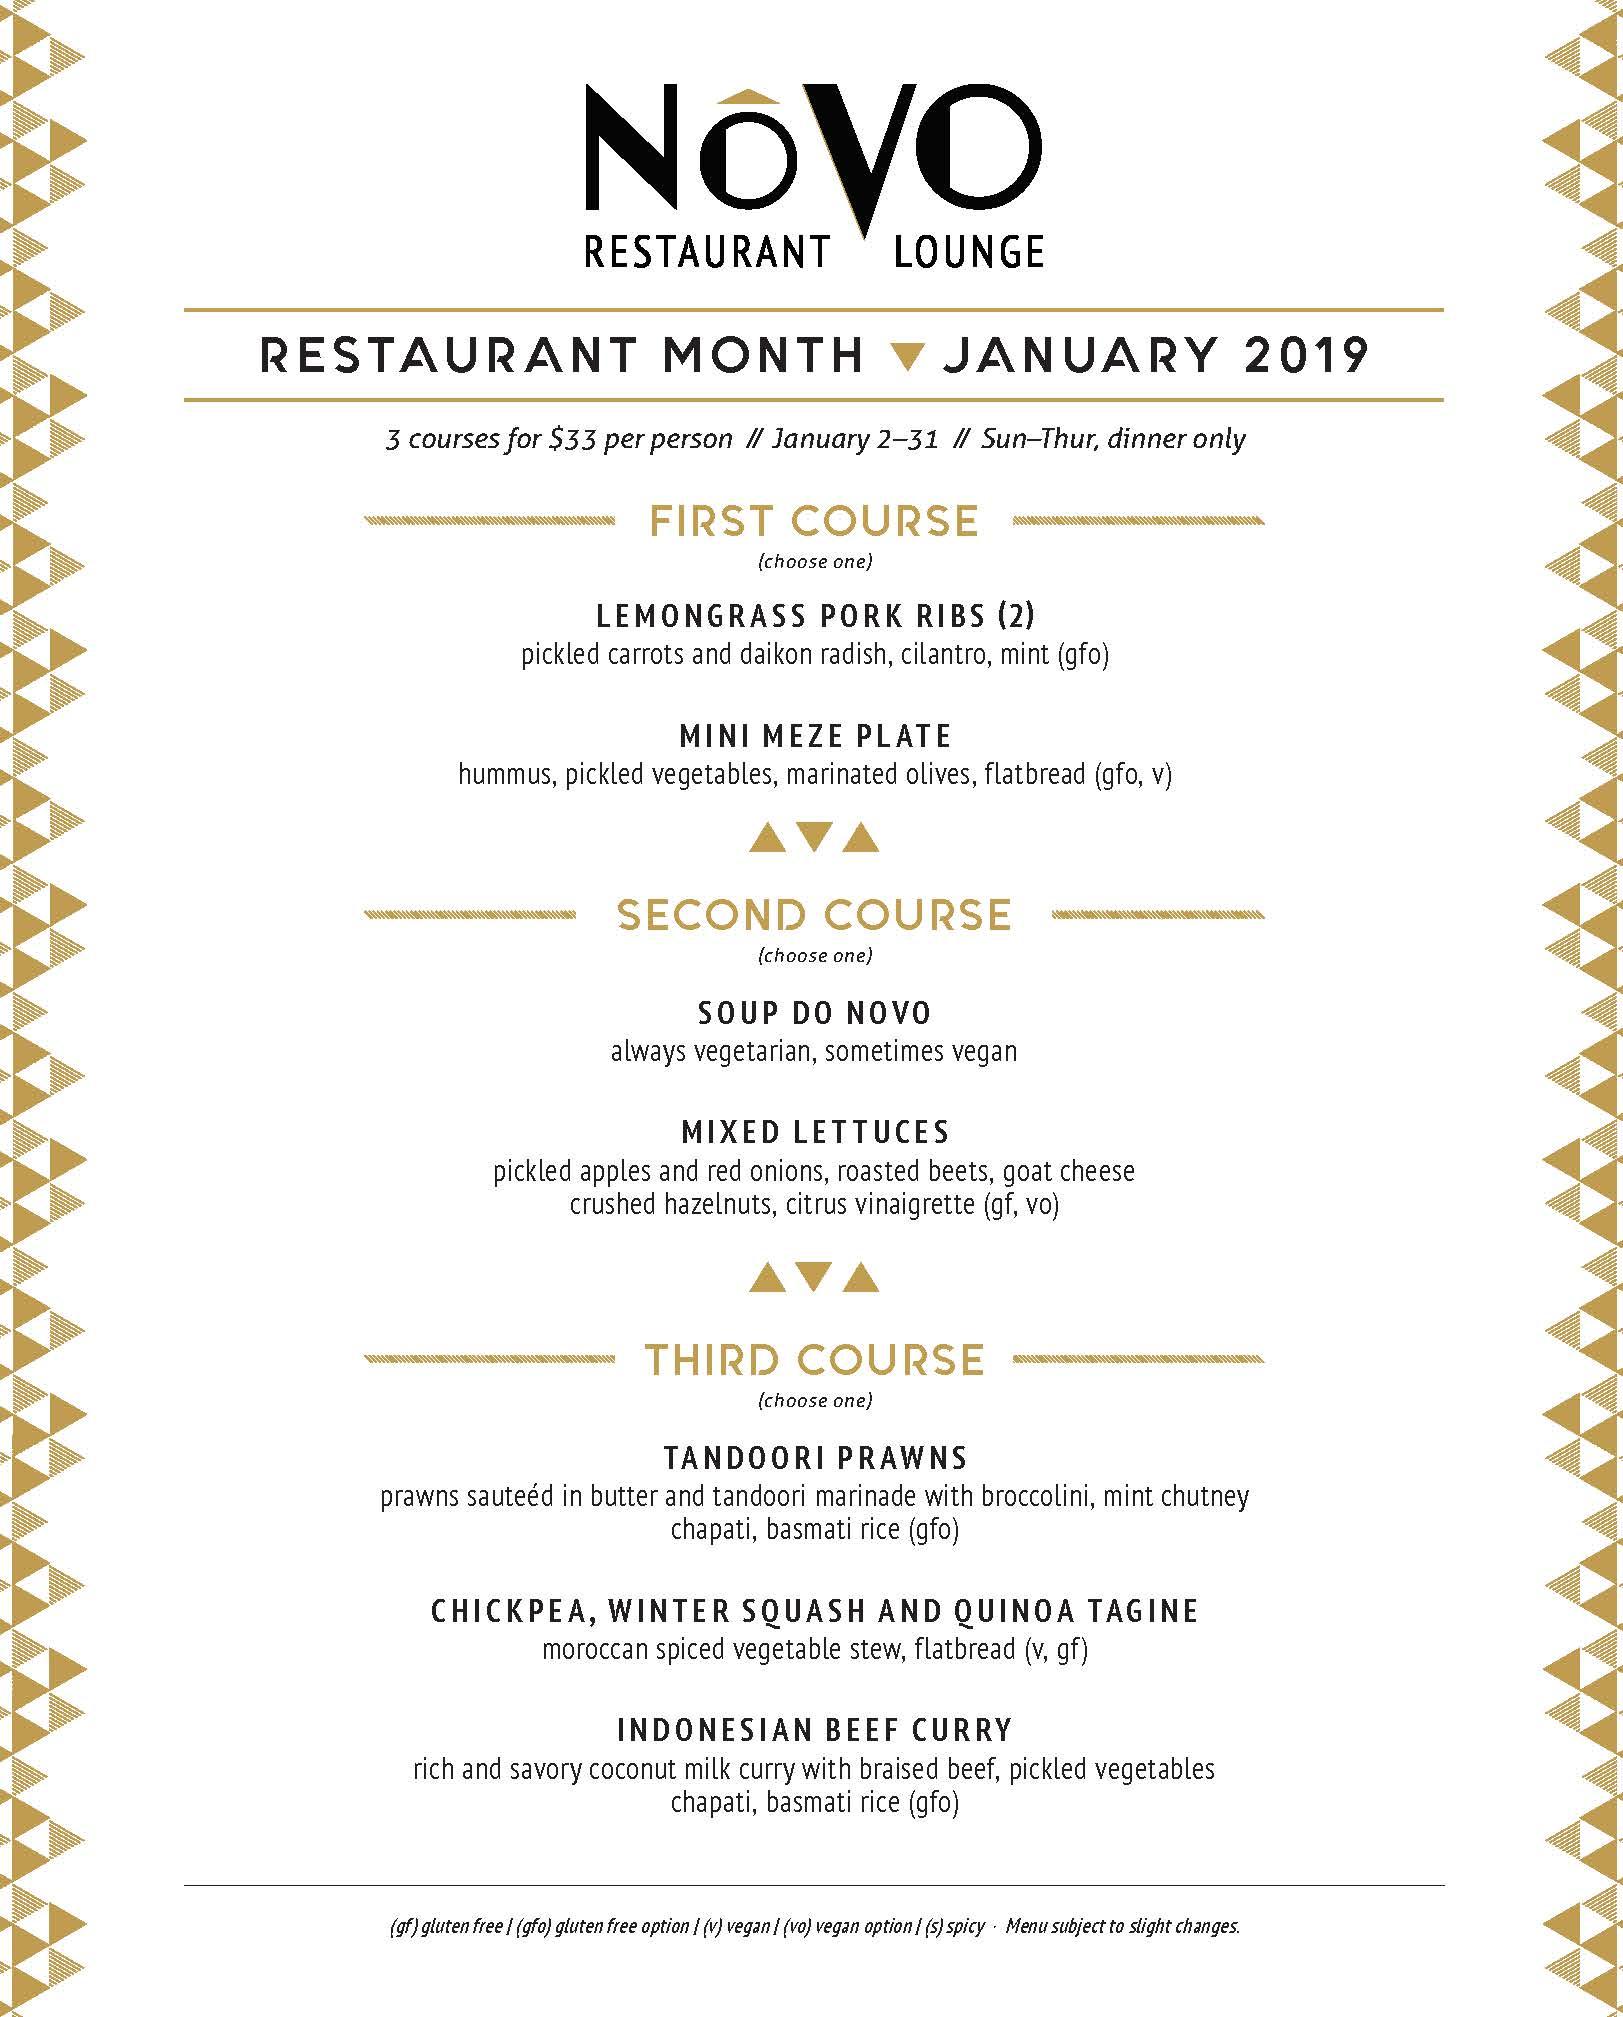 COV076-5012-Restaurant Month-Novo-8x10-PRINT.jpg